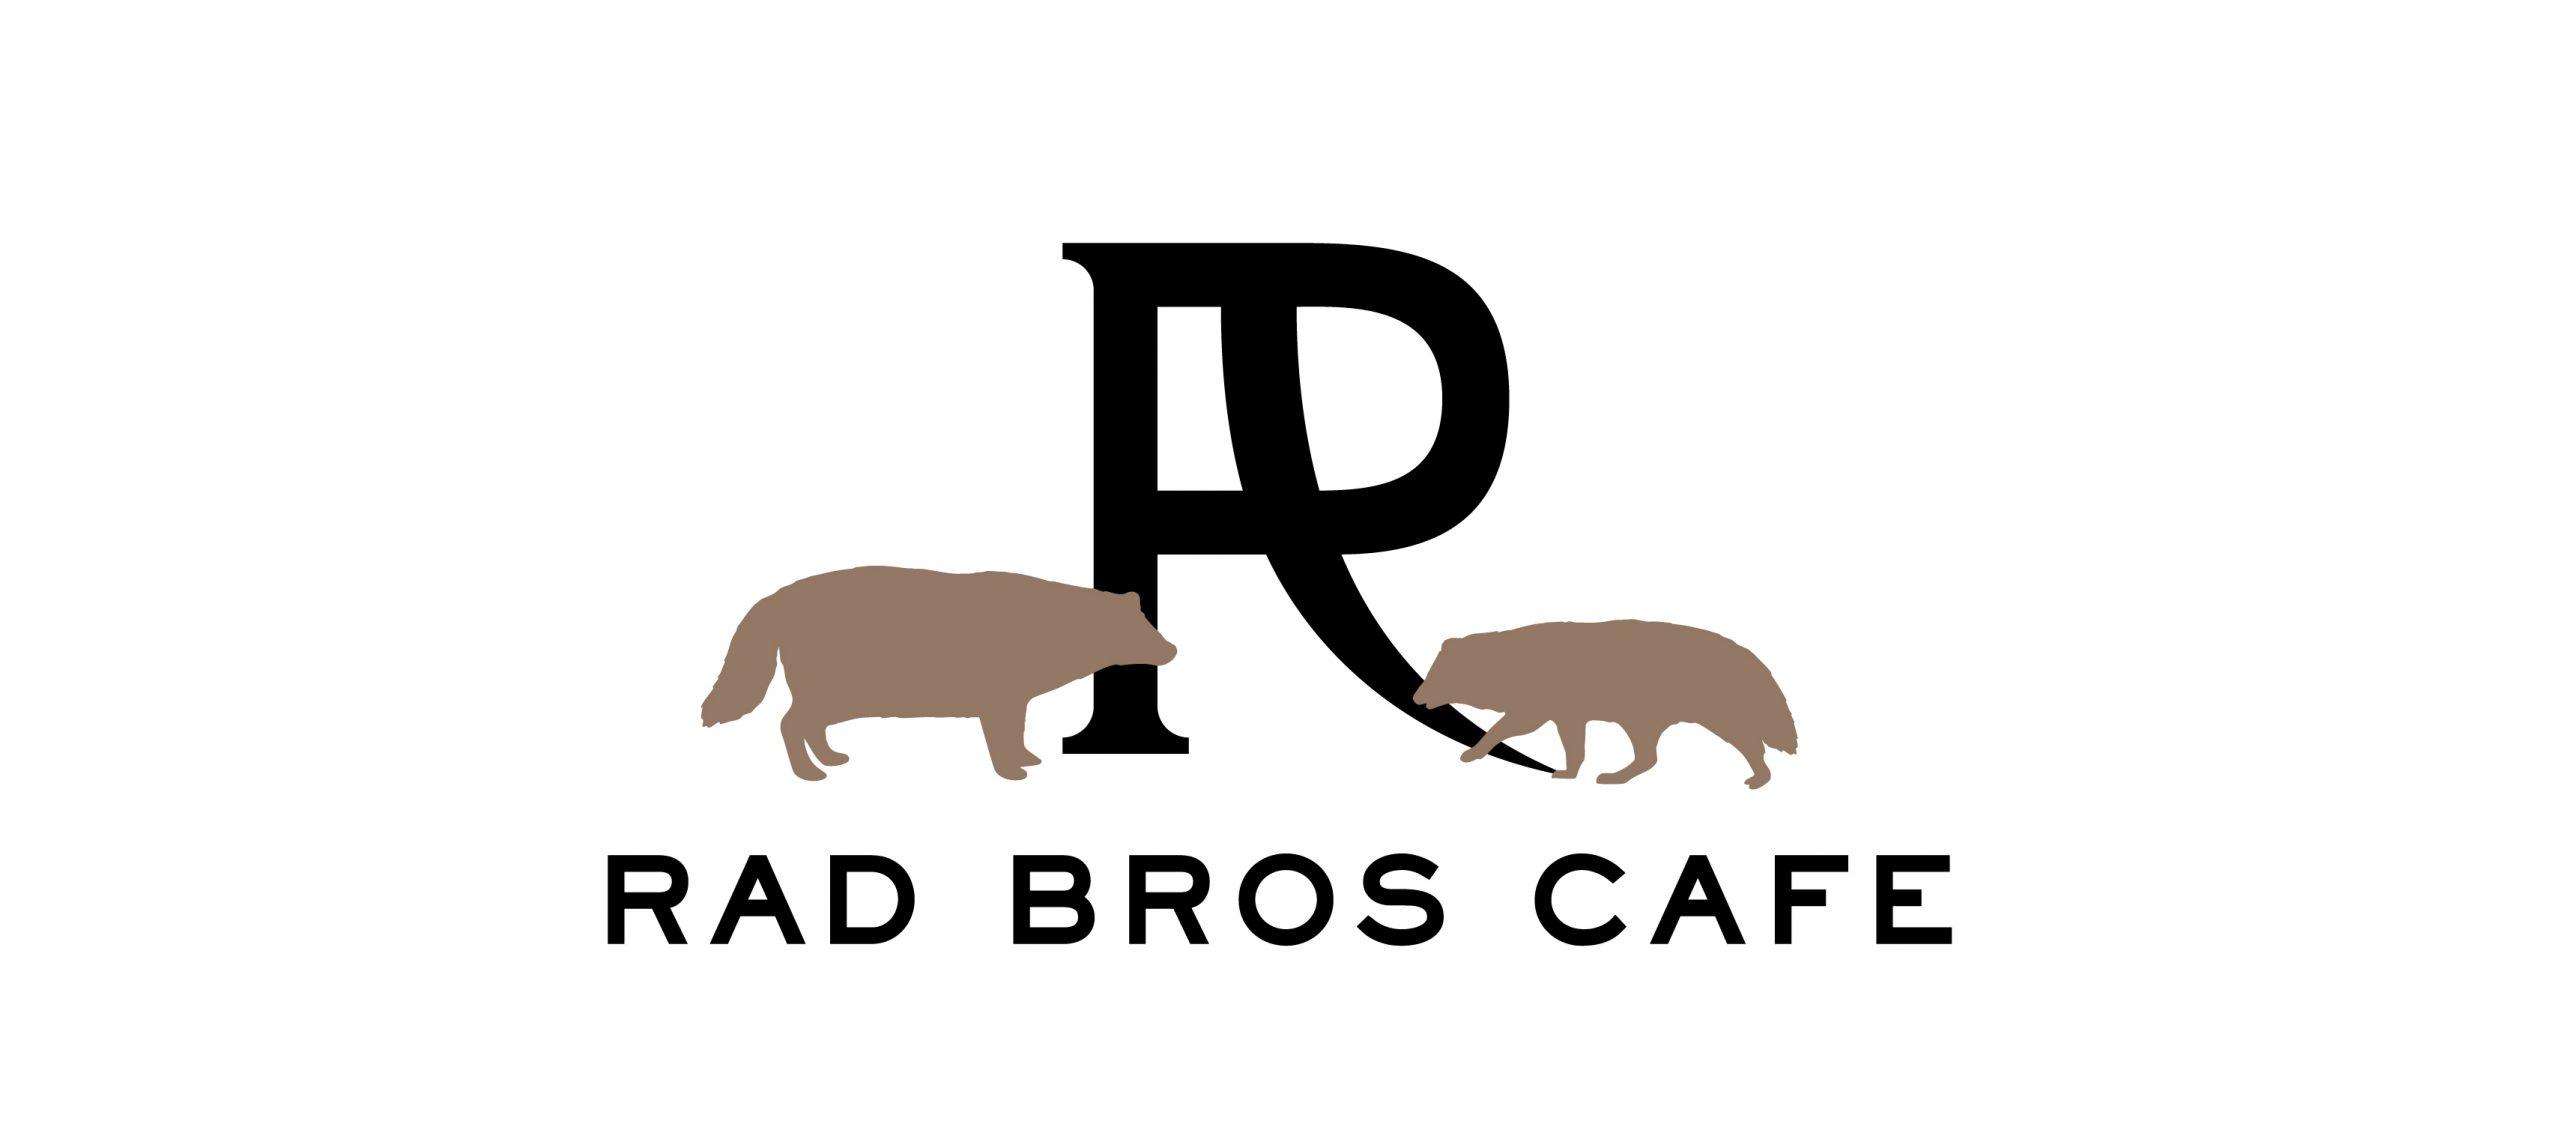 RAD BROS CAFE